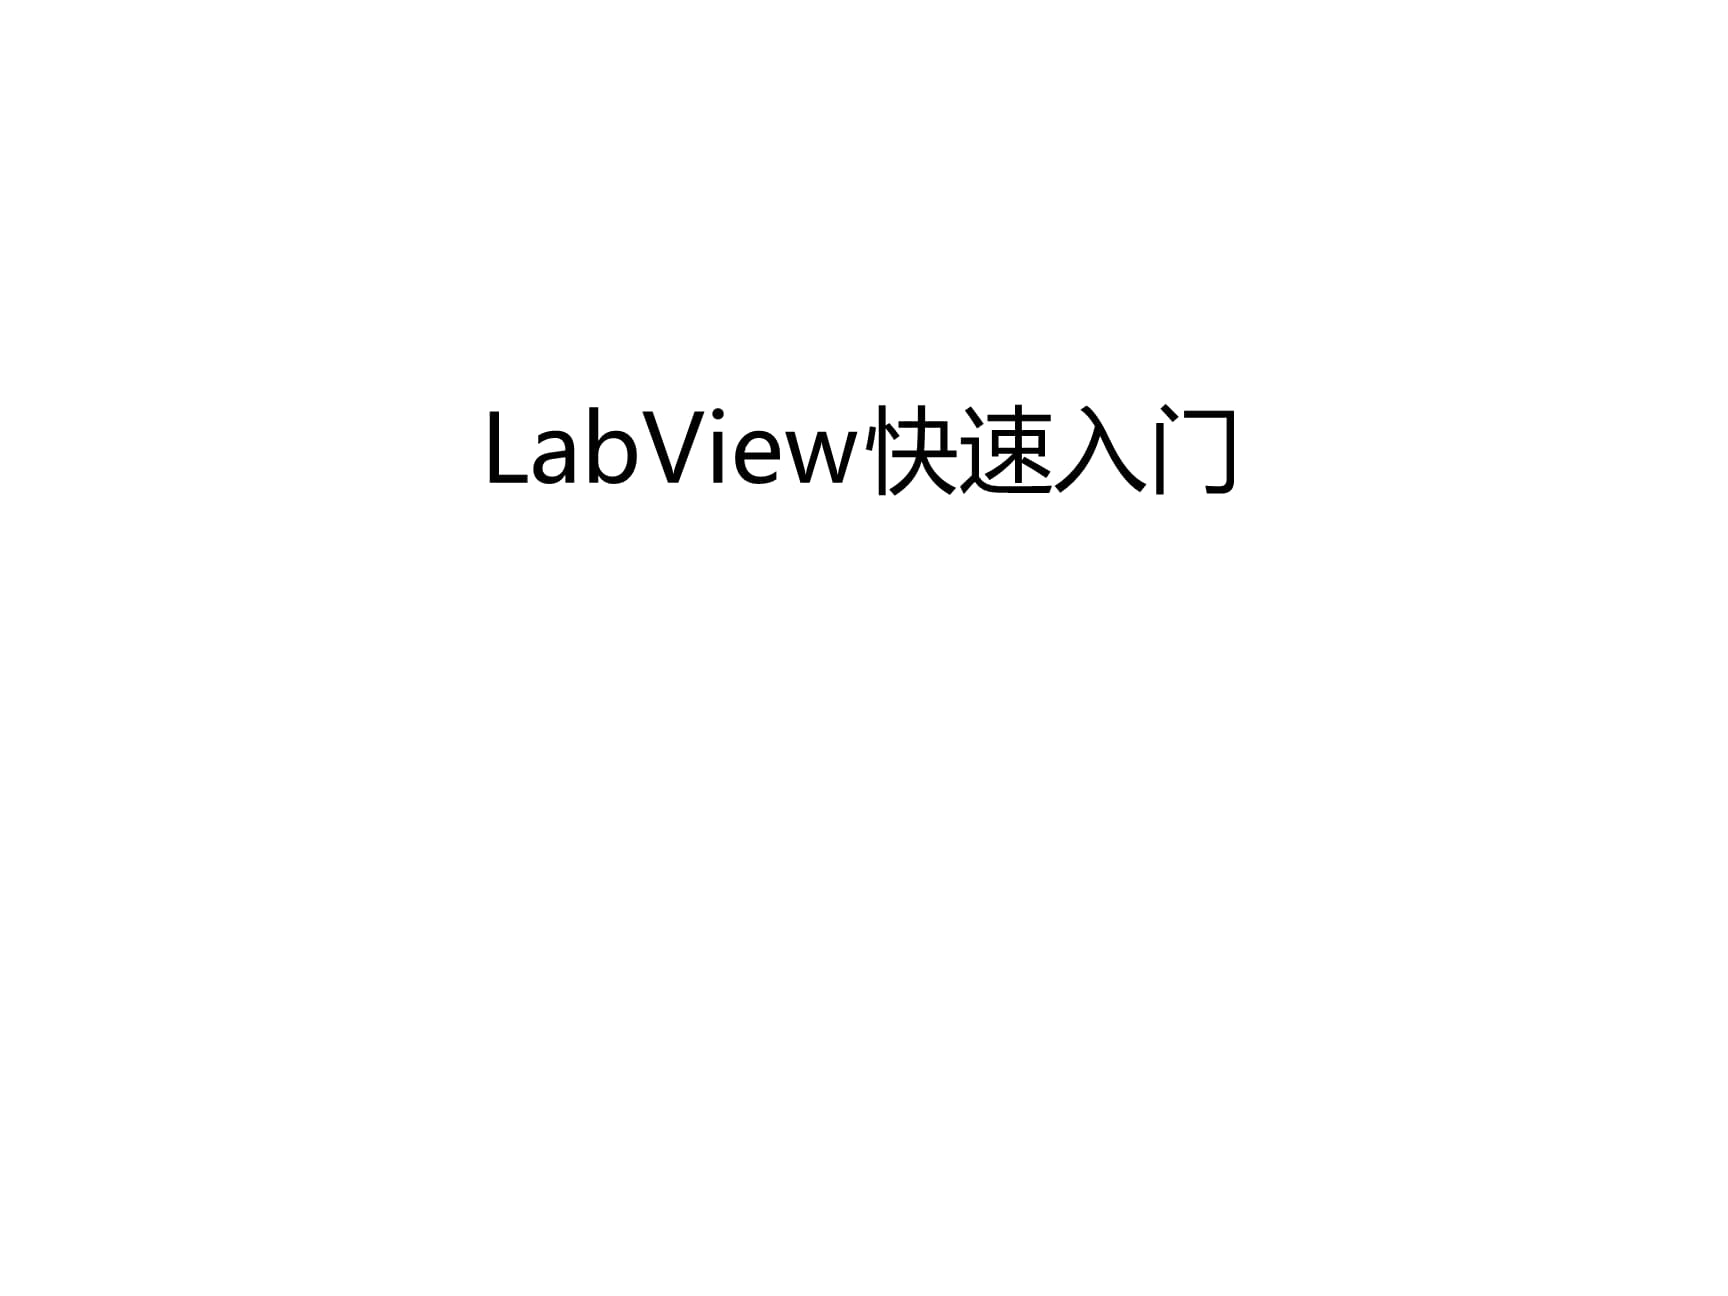 LabView快速入门演示教学.ppt